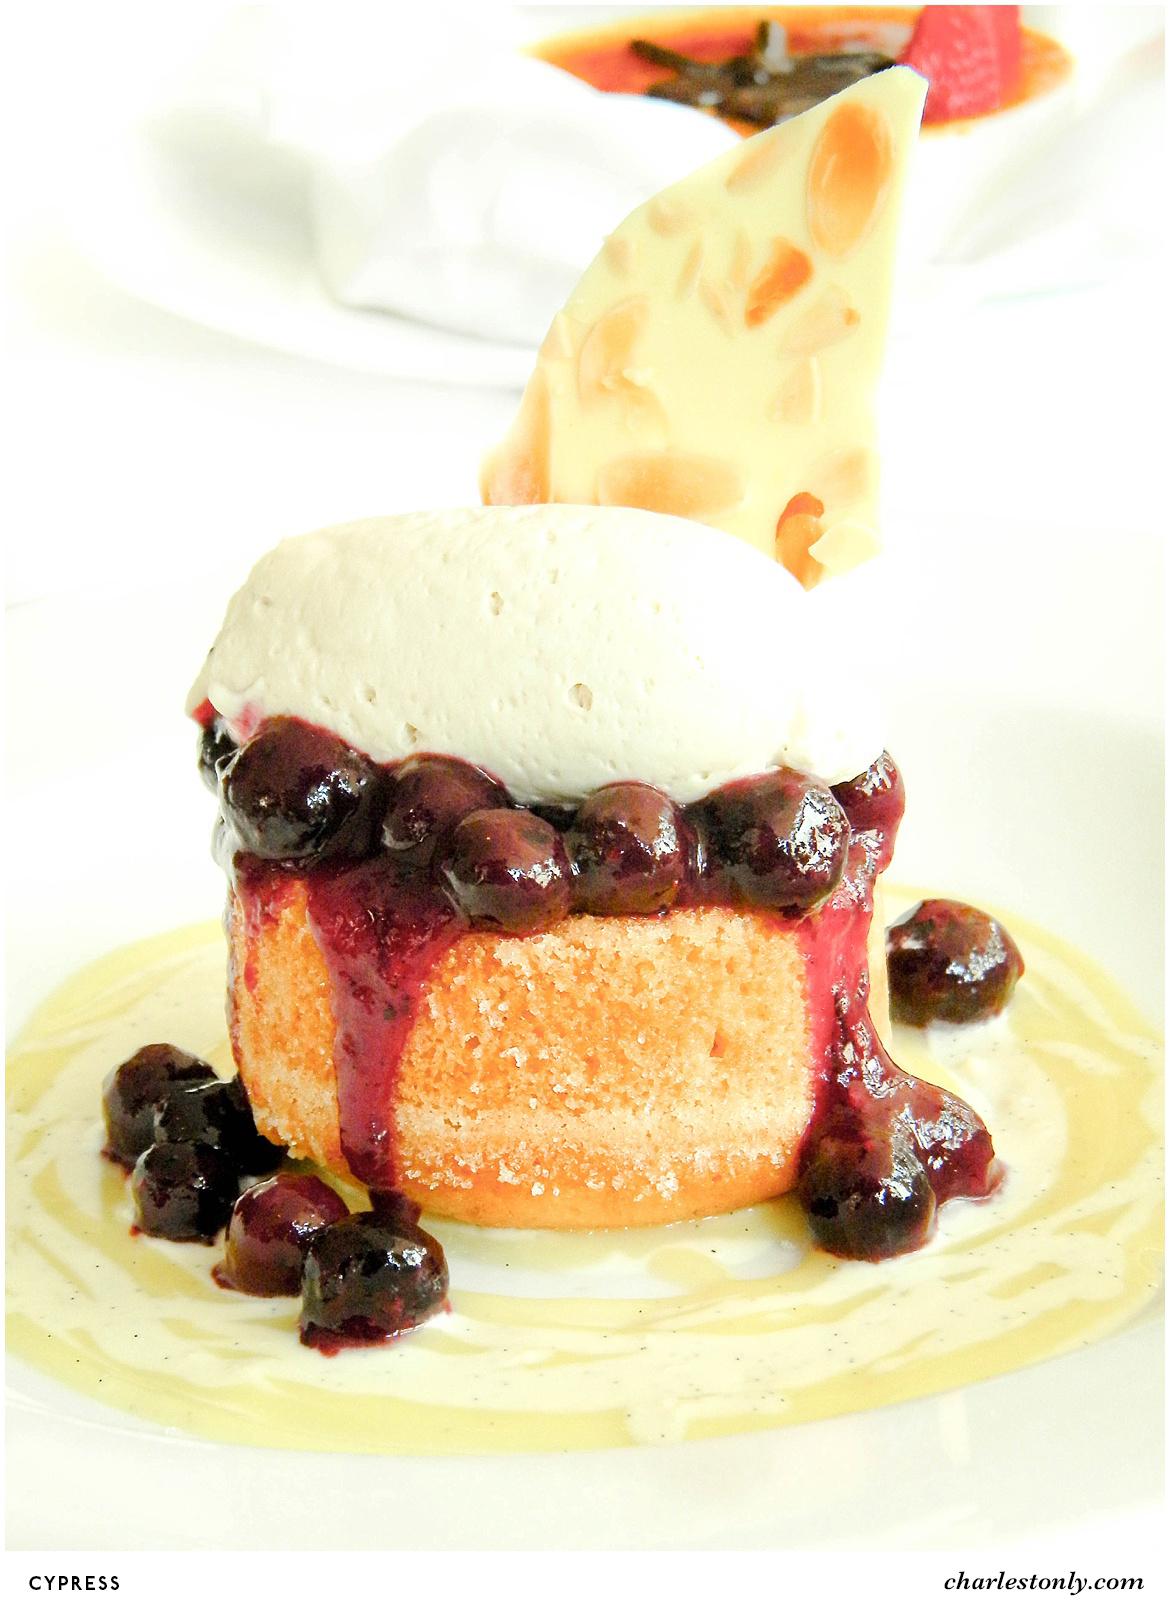 Charleston's Iconic Desserts - Explore Charleston Blog